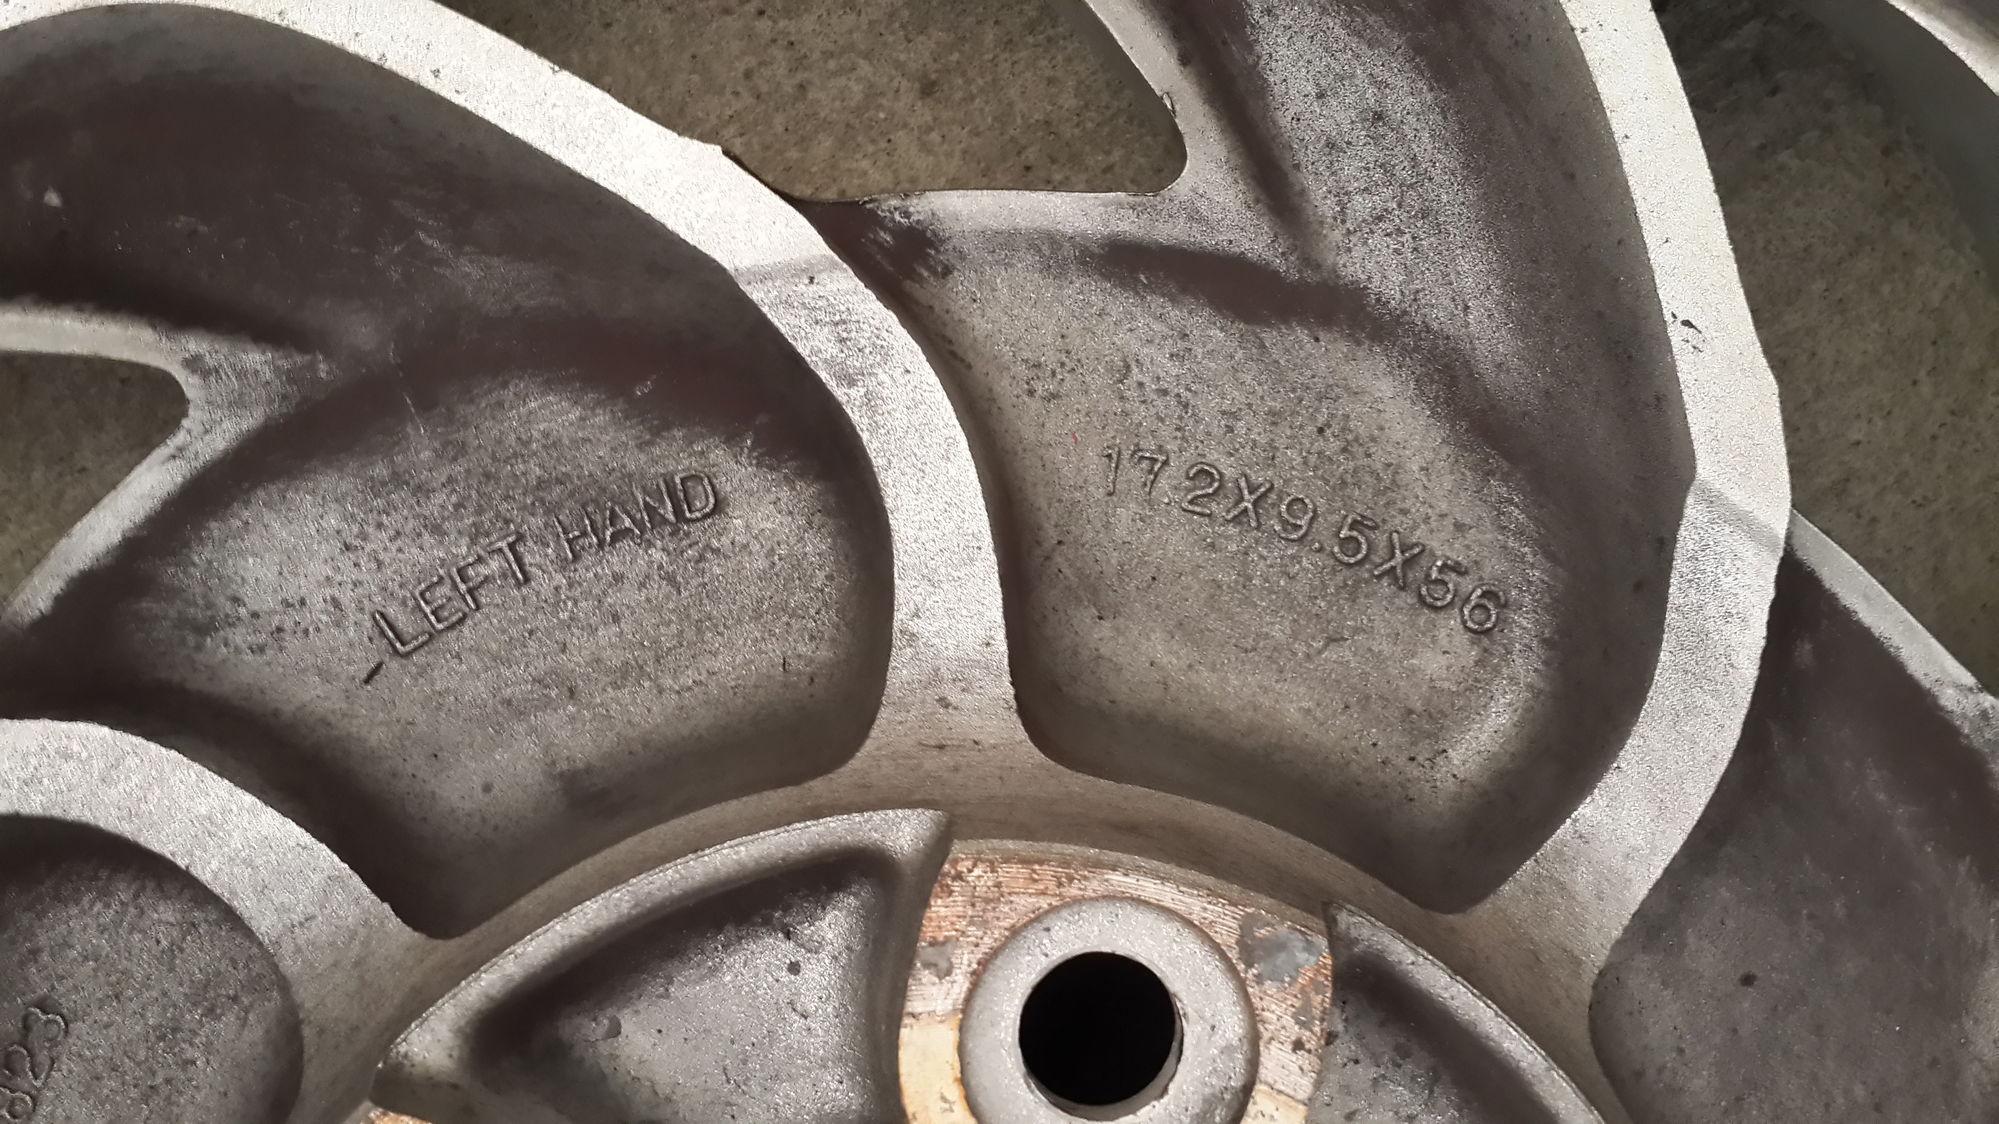 Zr1 rims and tires for sale - CorvetteForum - Chevrolet